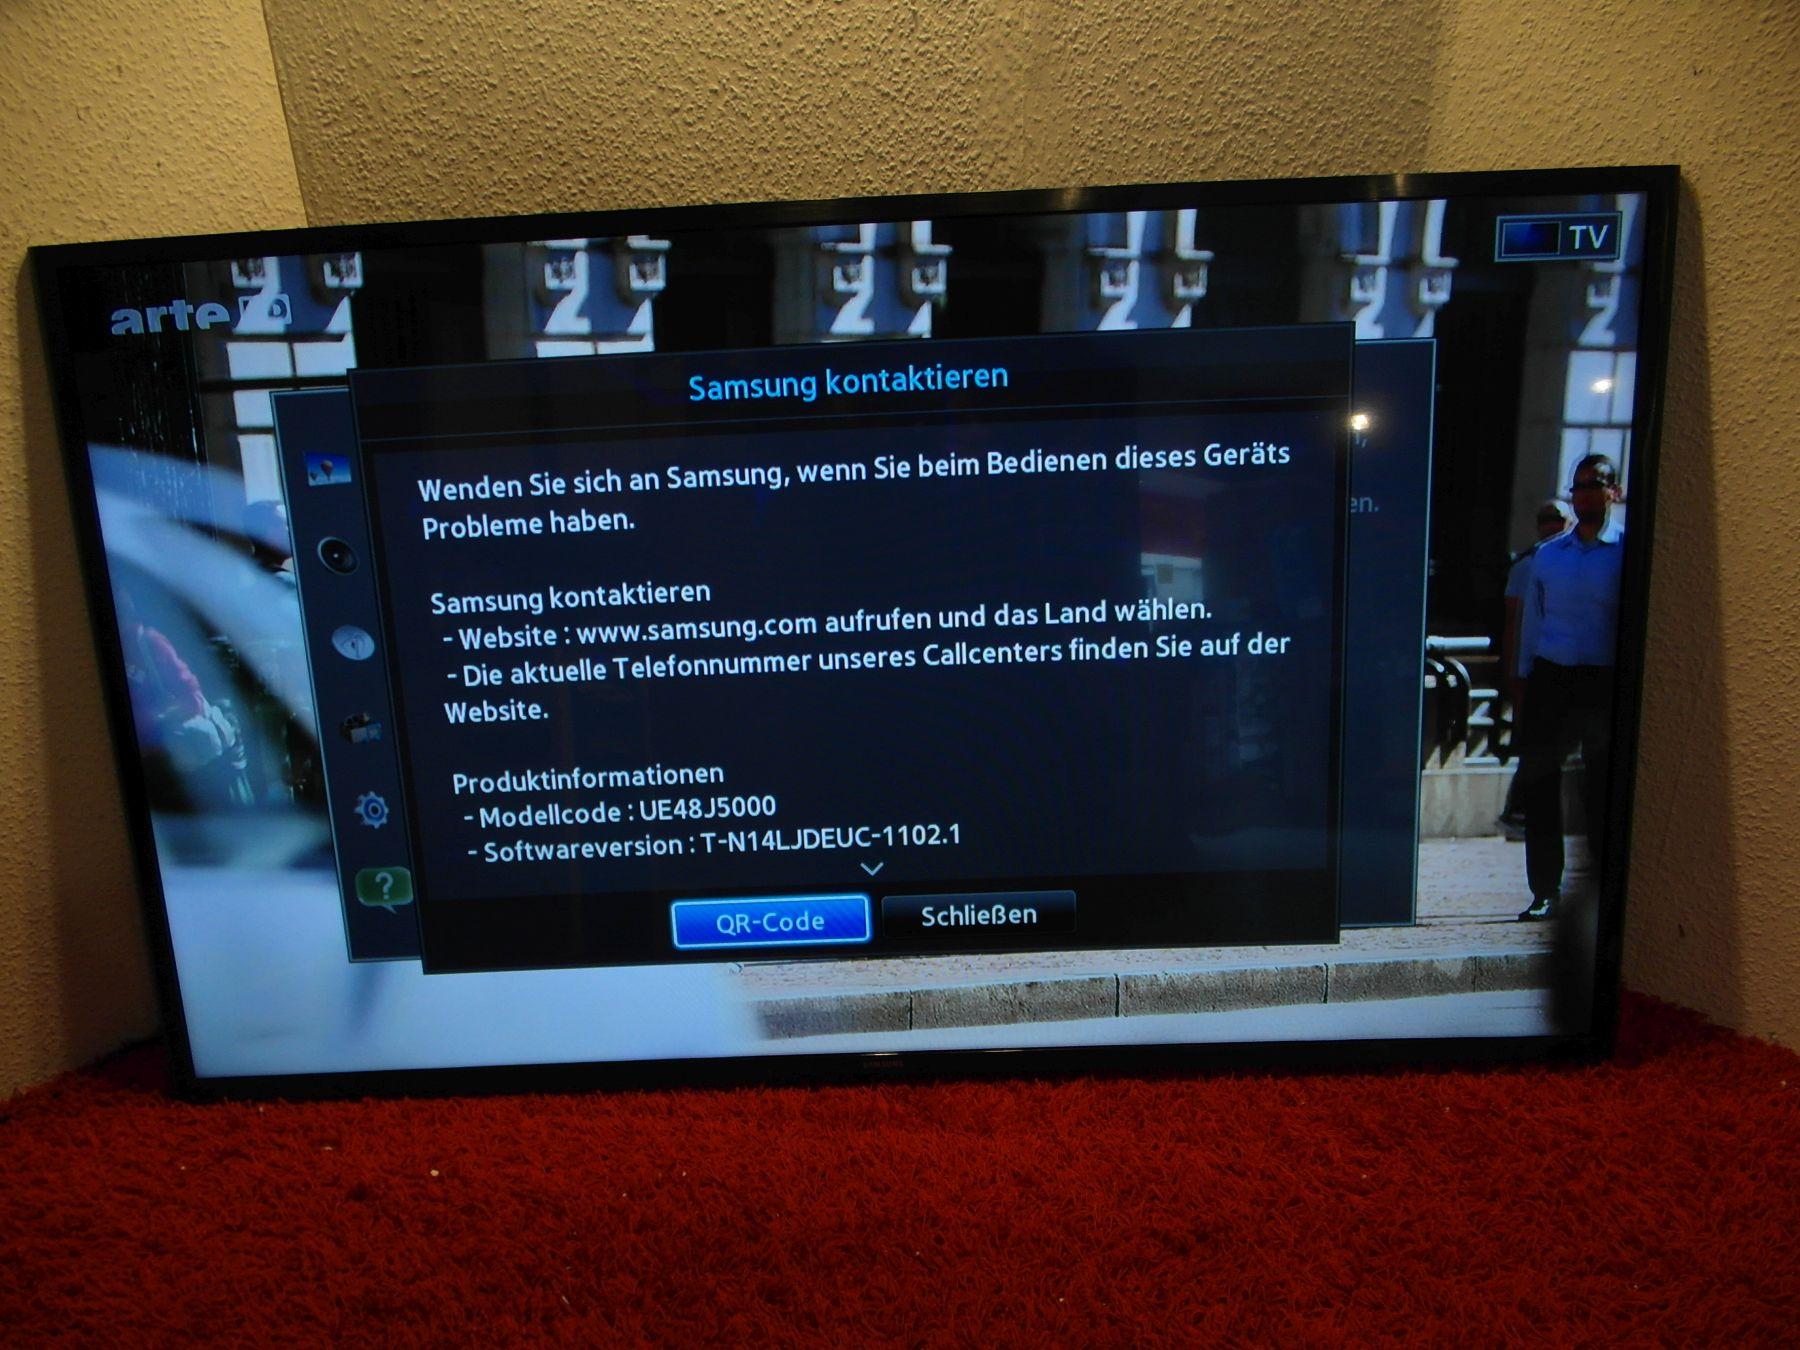 samsung ue48j5000 48 zoll led tv ohne dvb s 200 pqi siehe fotos 65bn ebay. Black Bedroom Furniture Sets. Home Design Ideas